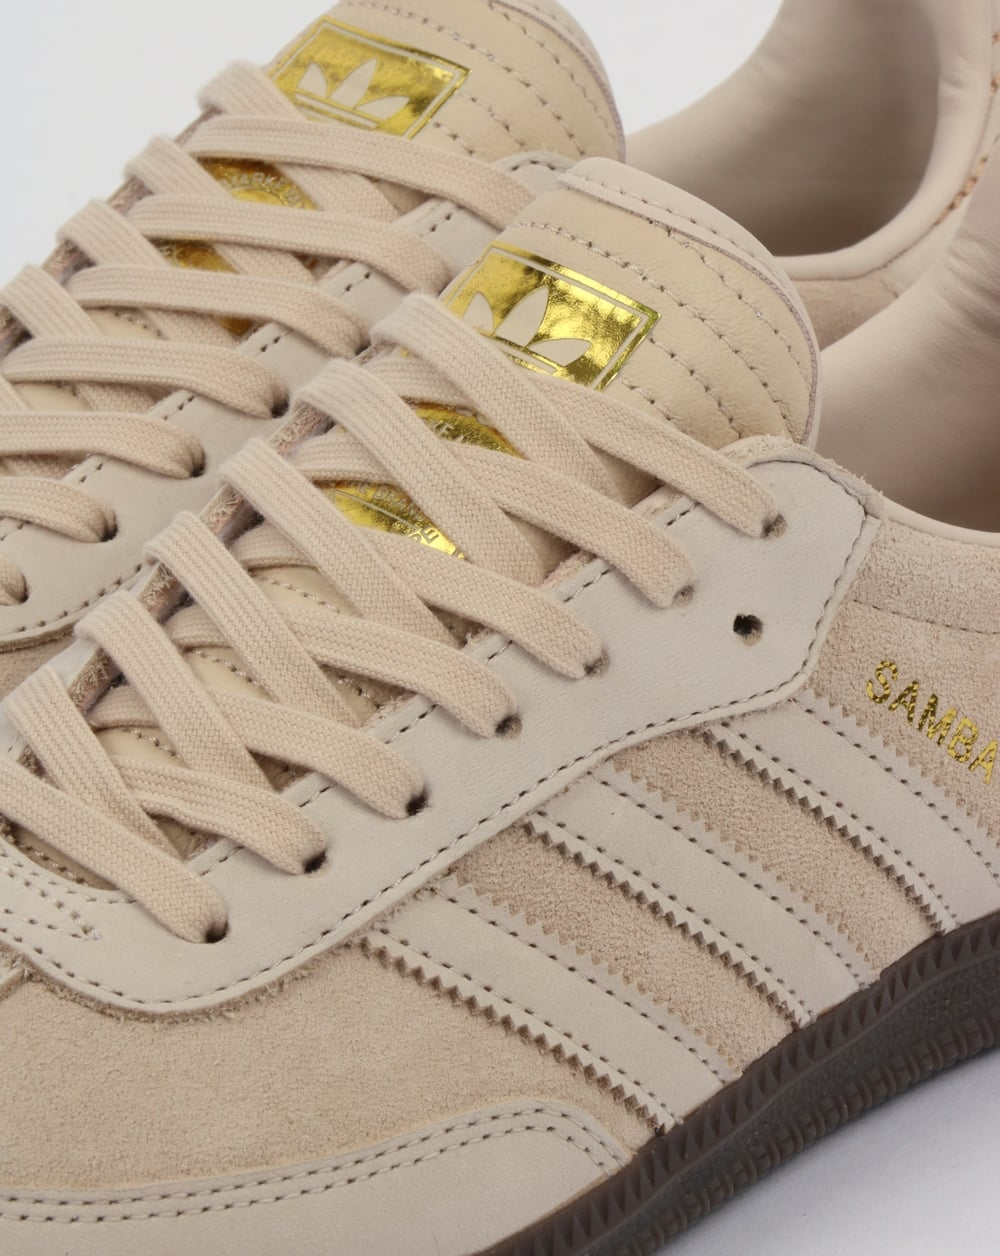 Adidas Samba Trainers white,linen,suede